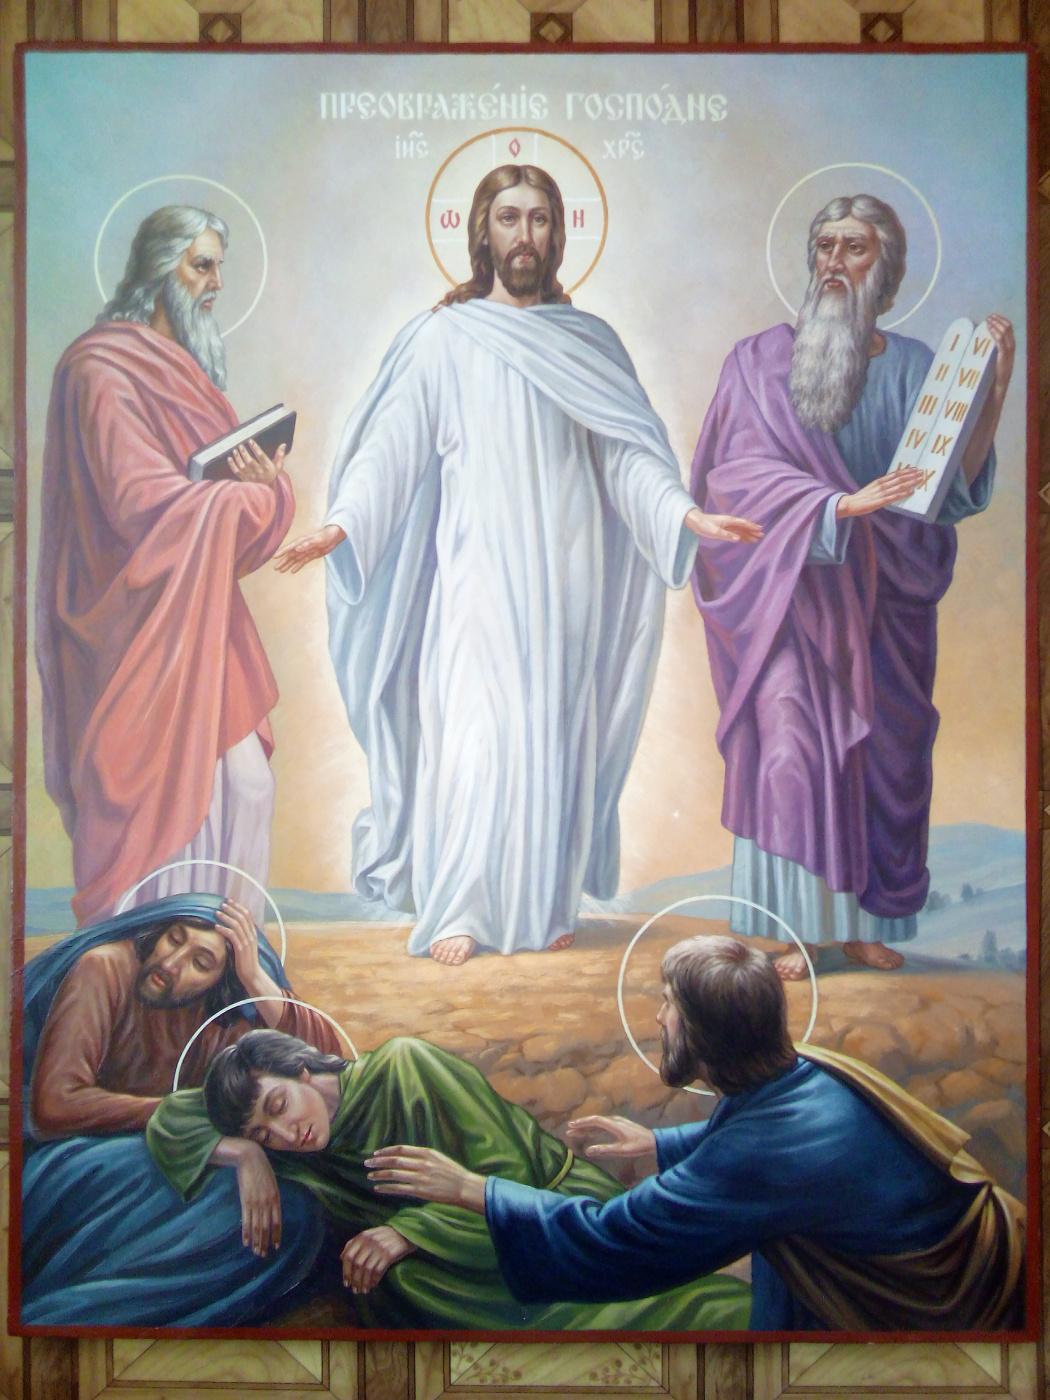 Ruslan Vasilievich Derevtsov. Transfiguration of the Lord (2018)